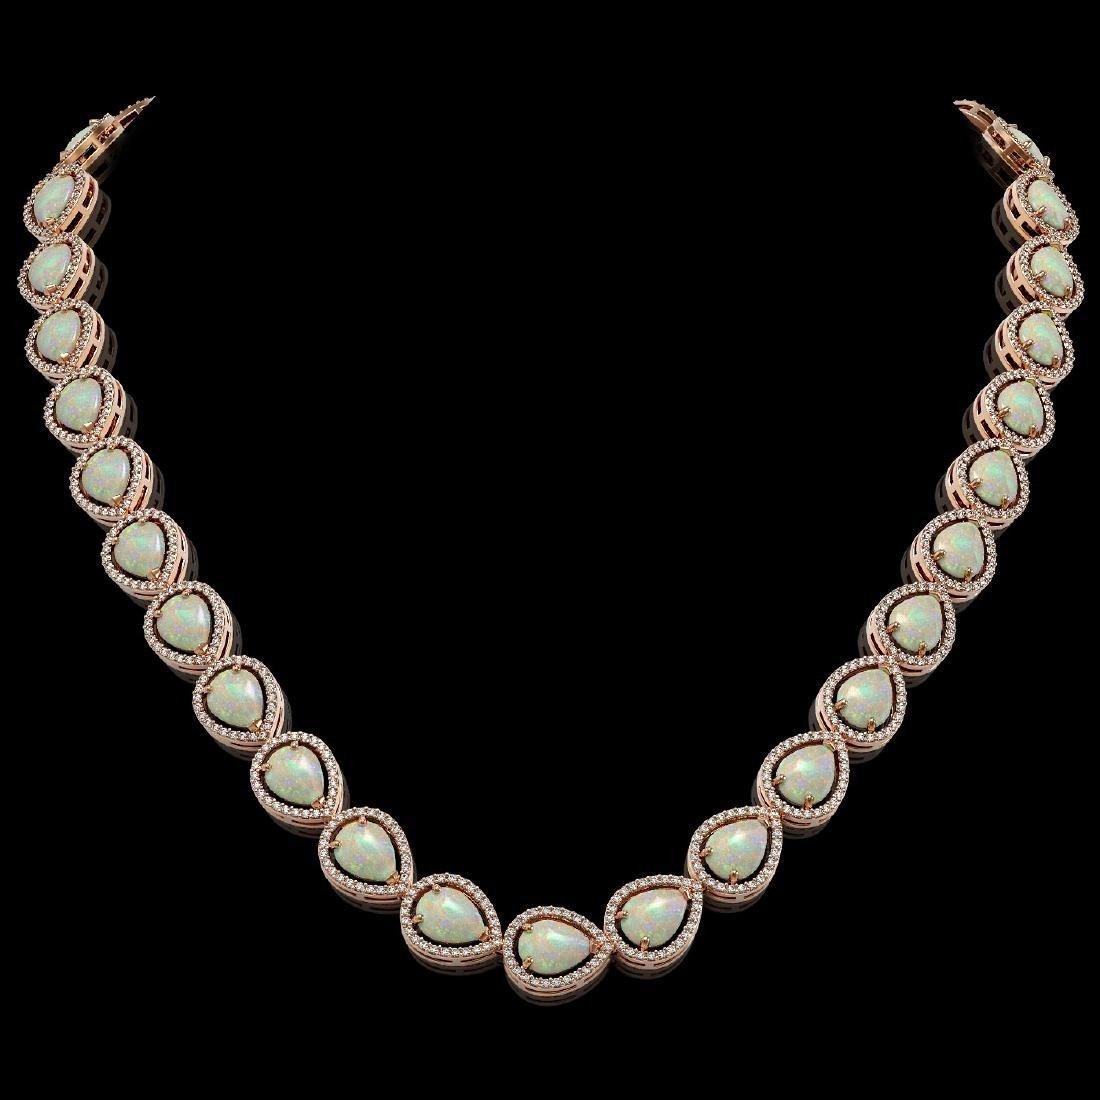 36.48 CTW Opal & Diamond Halo Necklace 10K Rose Gold